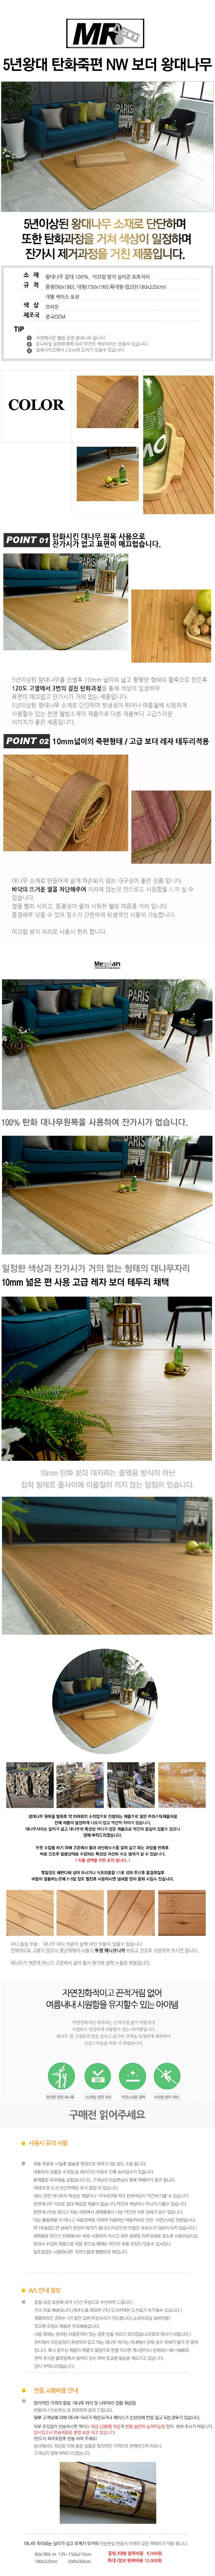 4.tanhwajukpyeon.jpg